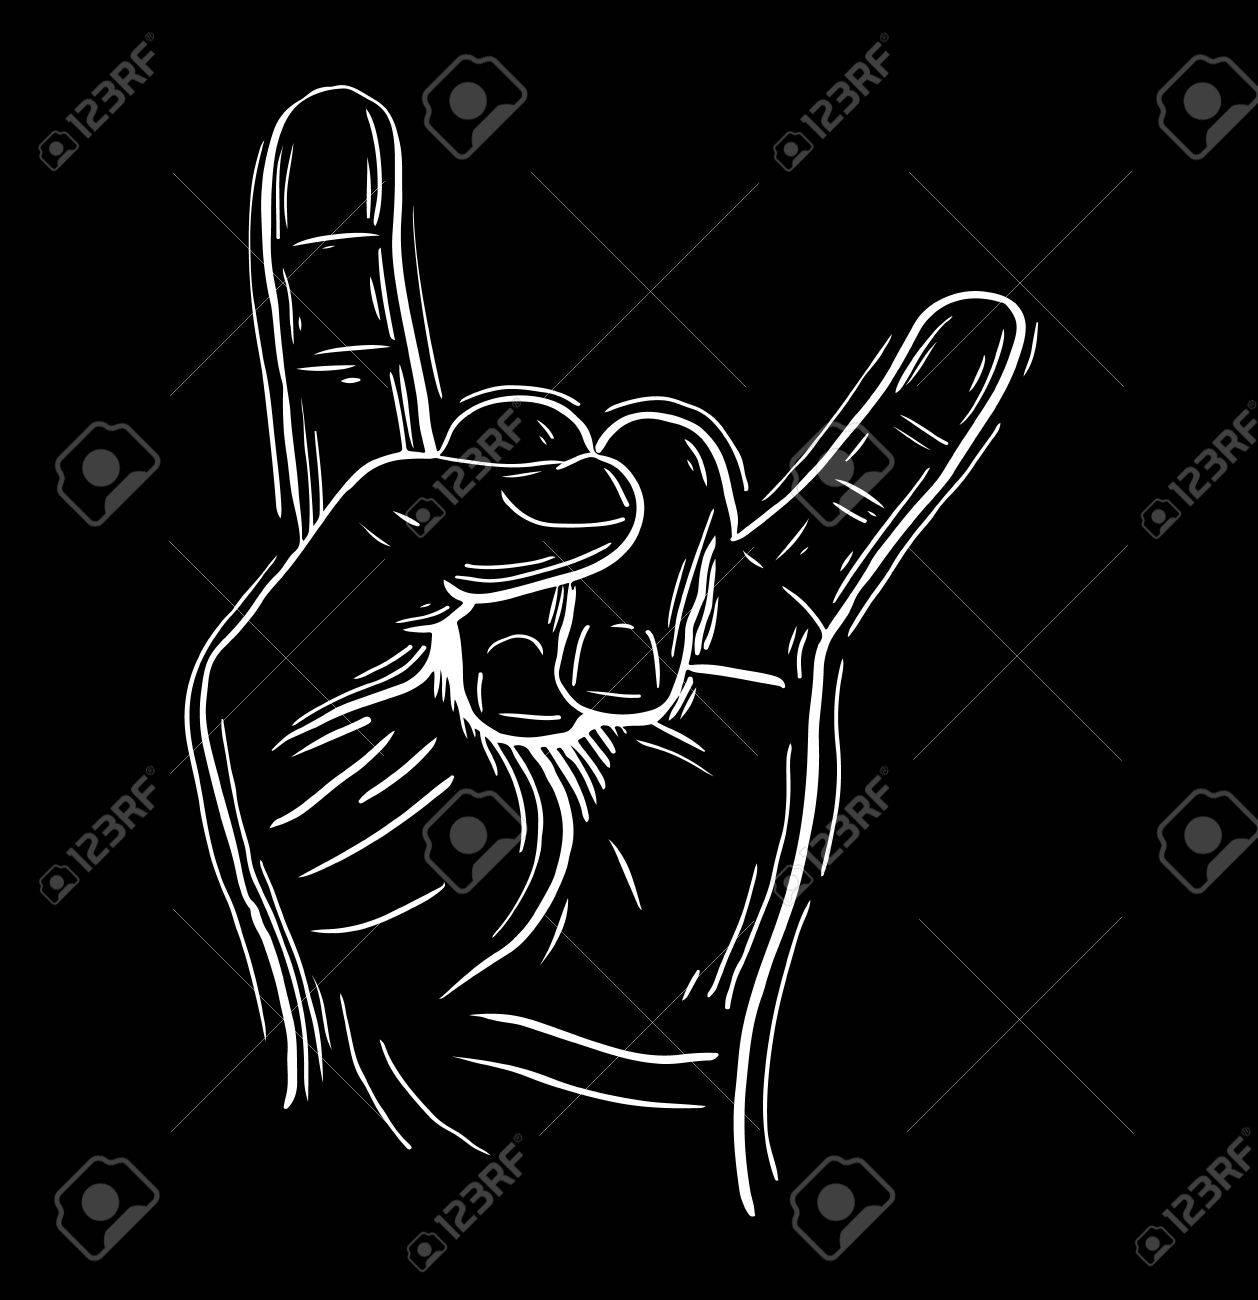 Bekannt Rock An Hand Zeichen, Rock N Roll, Hard Rock, Heavy Metal, Musik  AC19